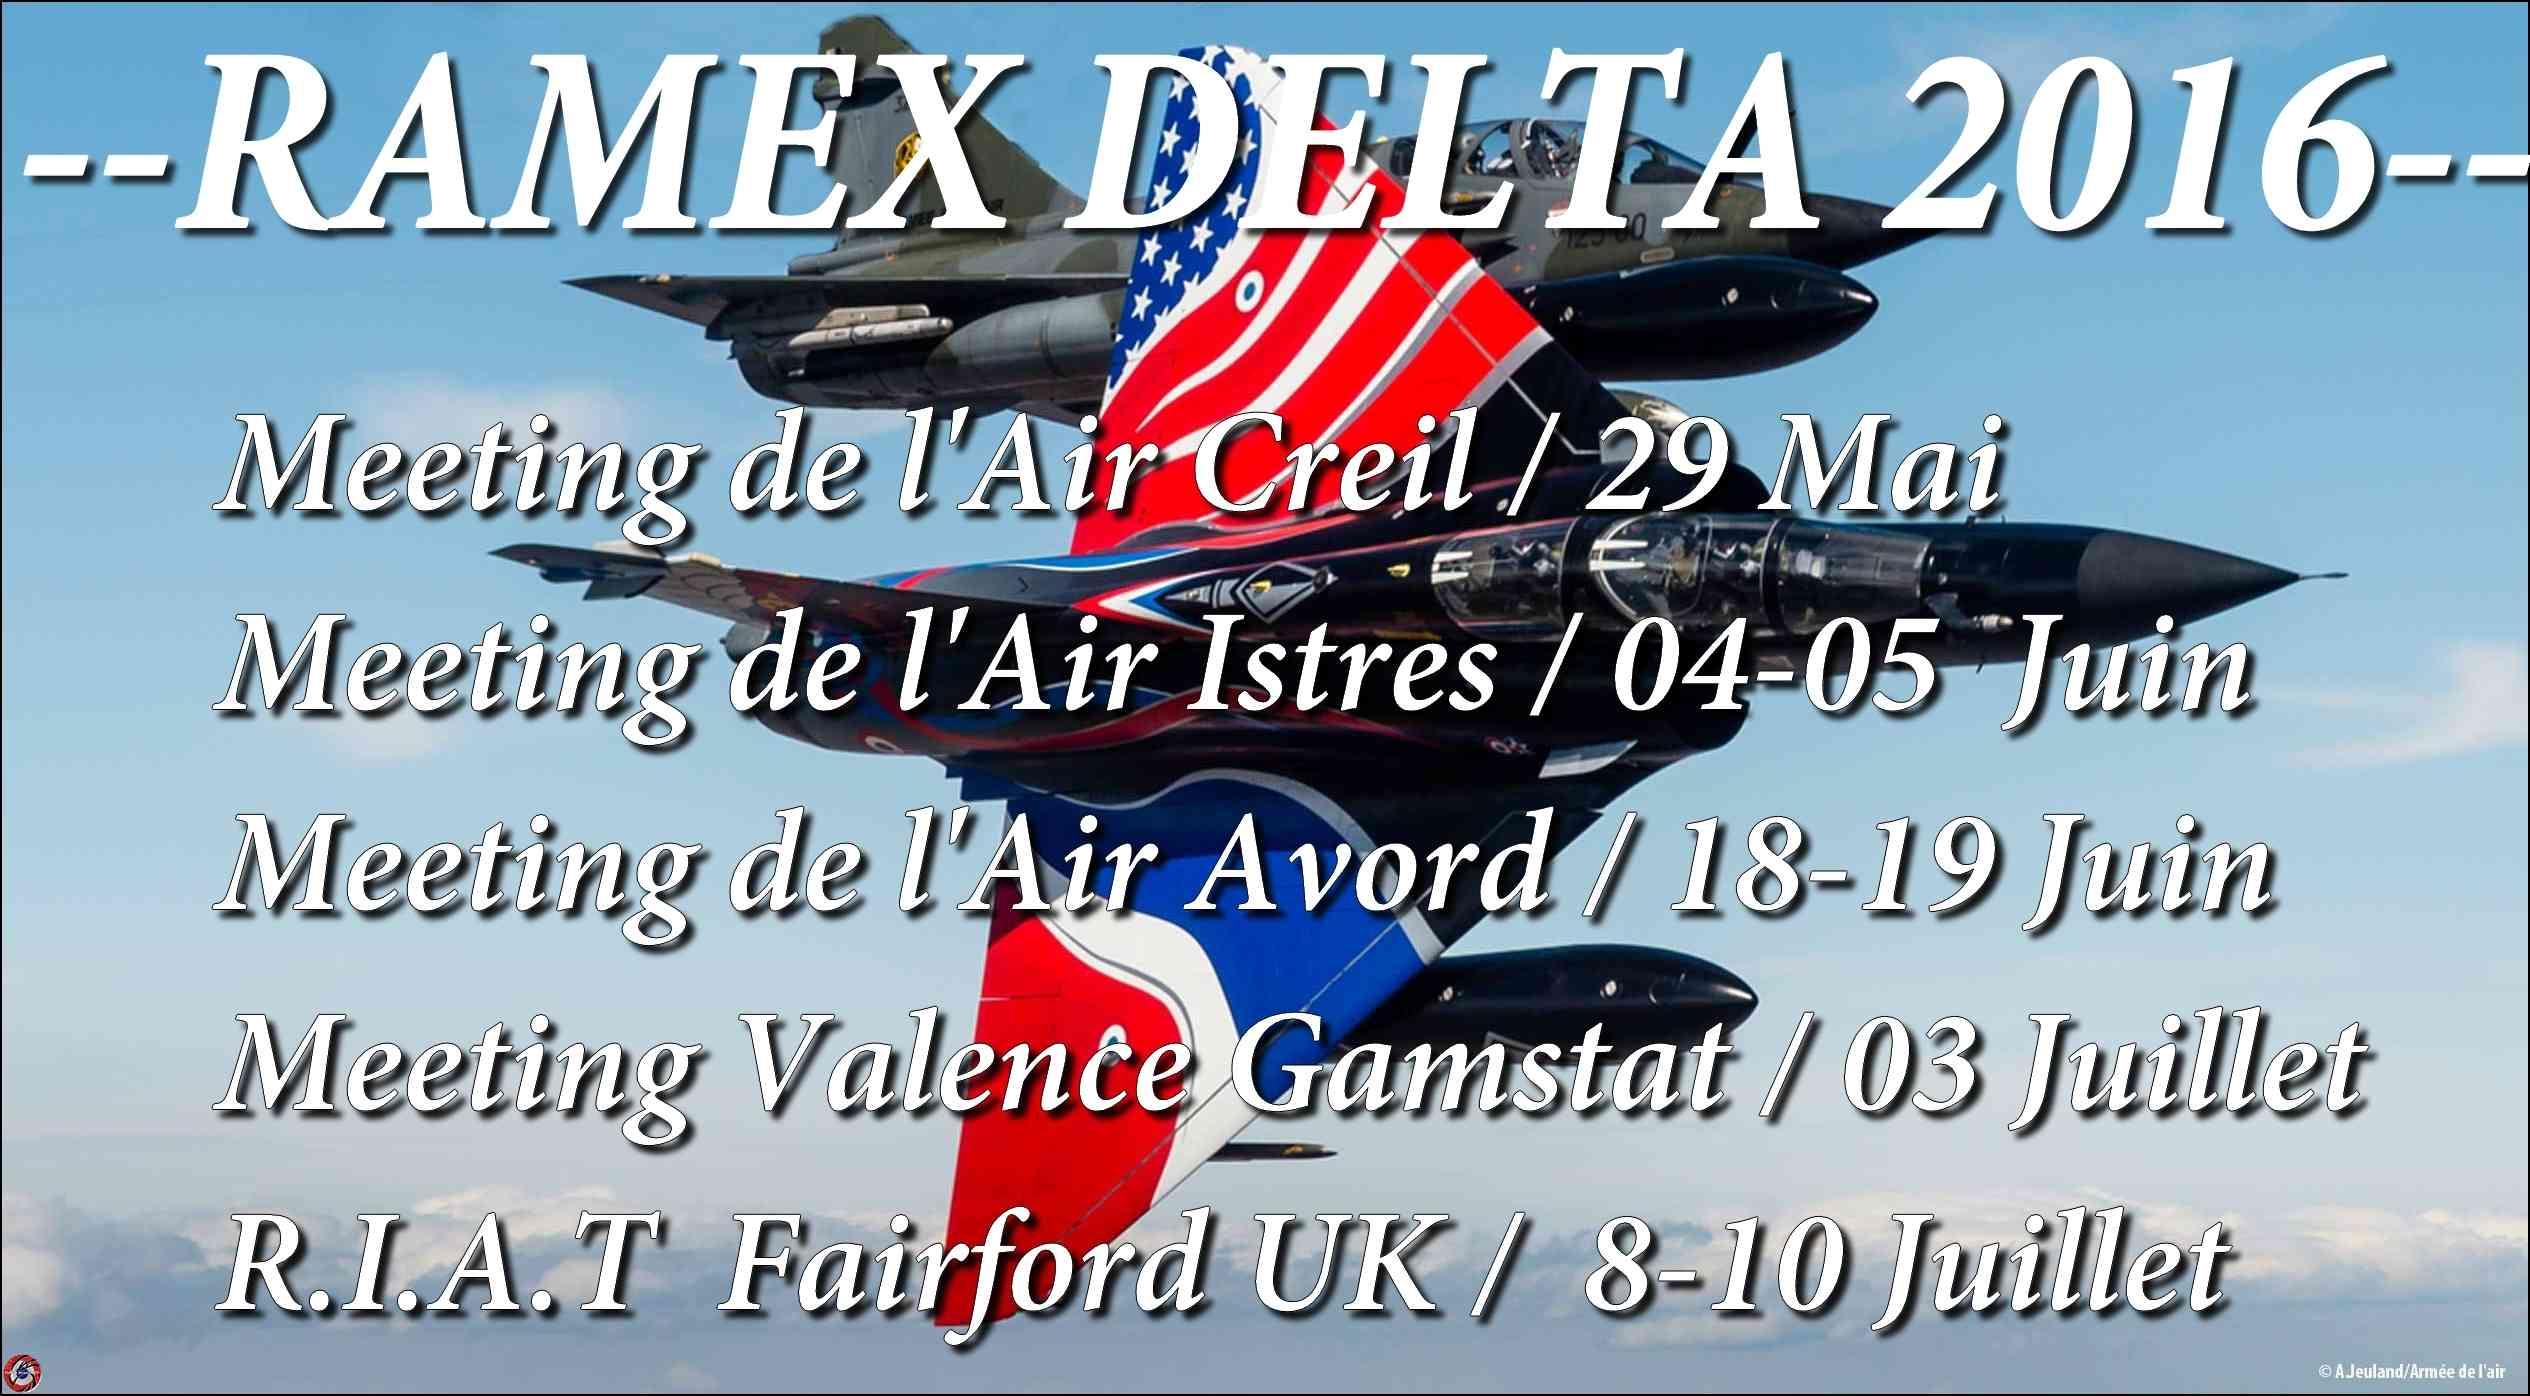 Ramex Delta 2016